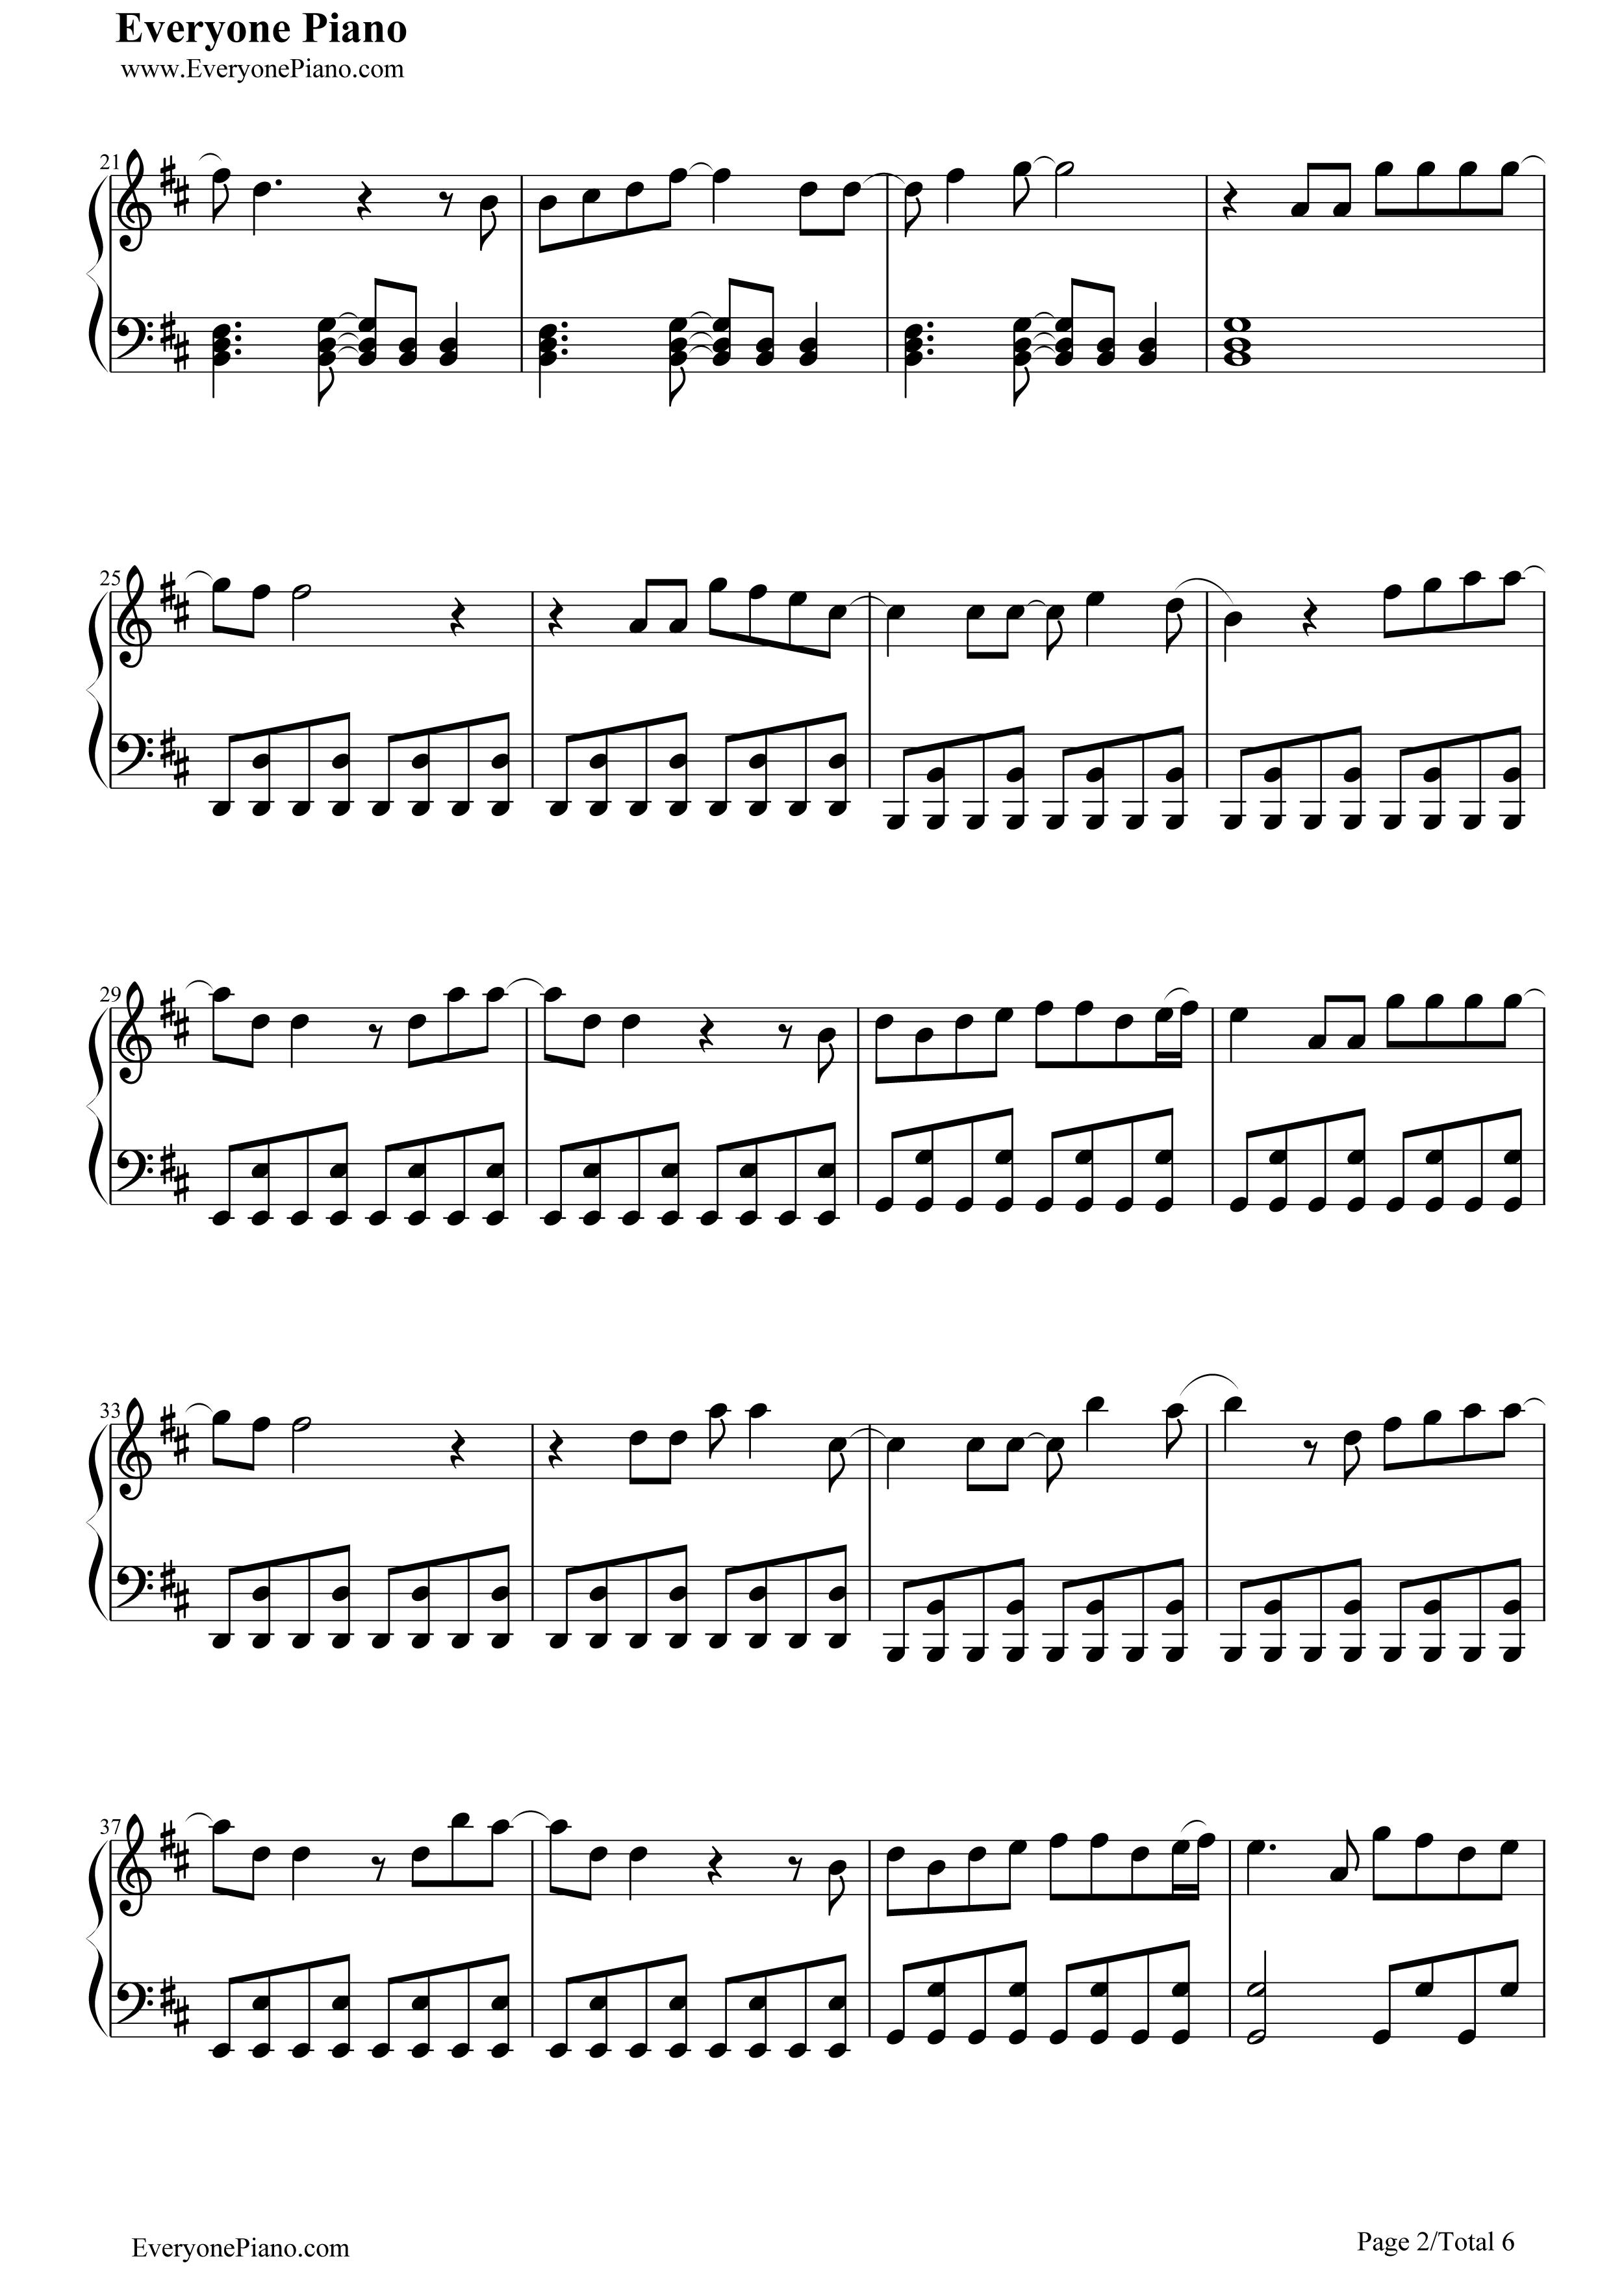 xo五线谱预览2 钢琴谱档 五线谱 双手简谱 数位谱 Midi PDF 免费下载